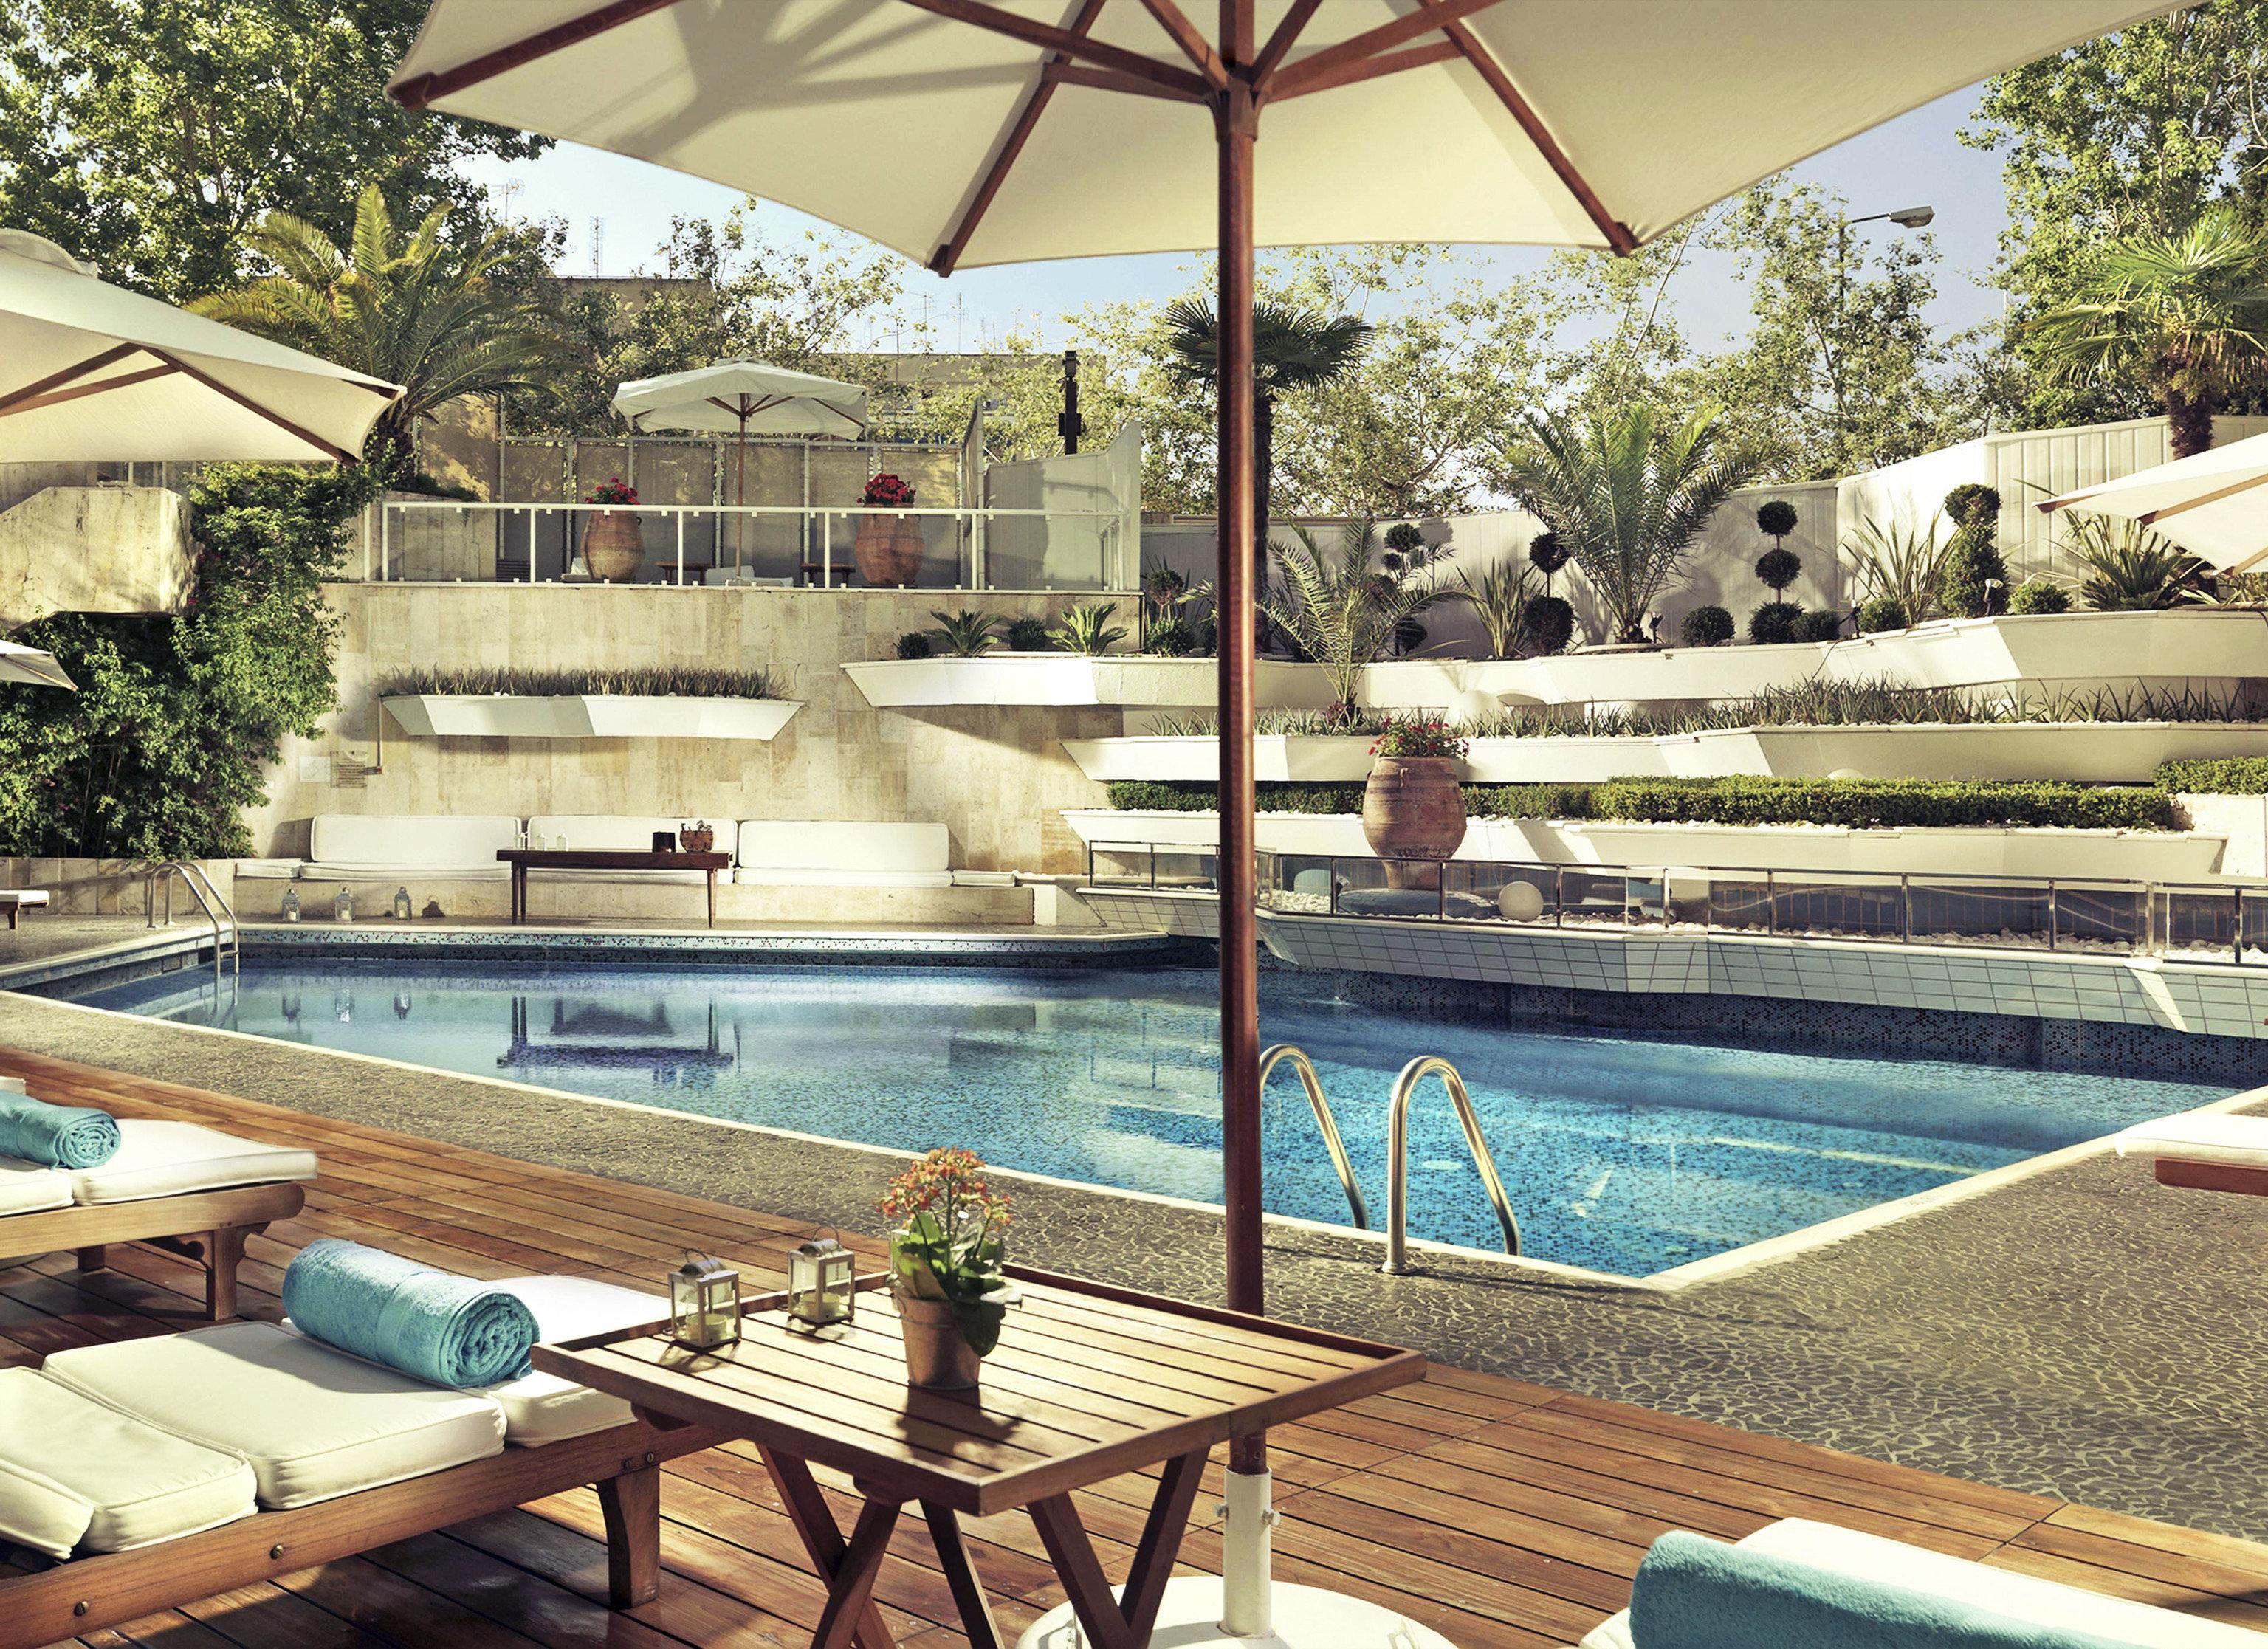 swimming pool leisure property Resort Villa backyard condominium home outdoor structure cottage